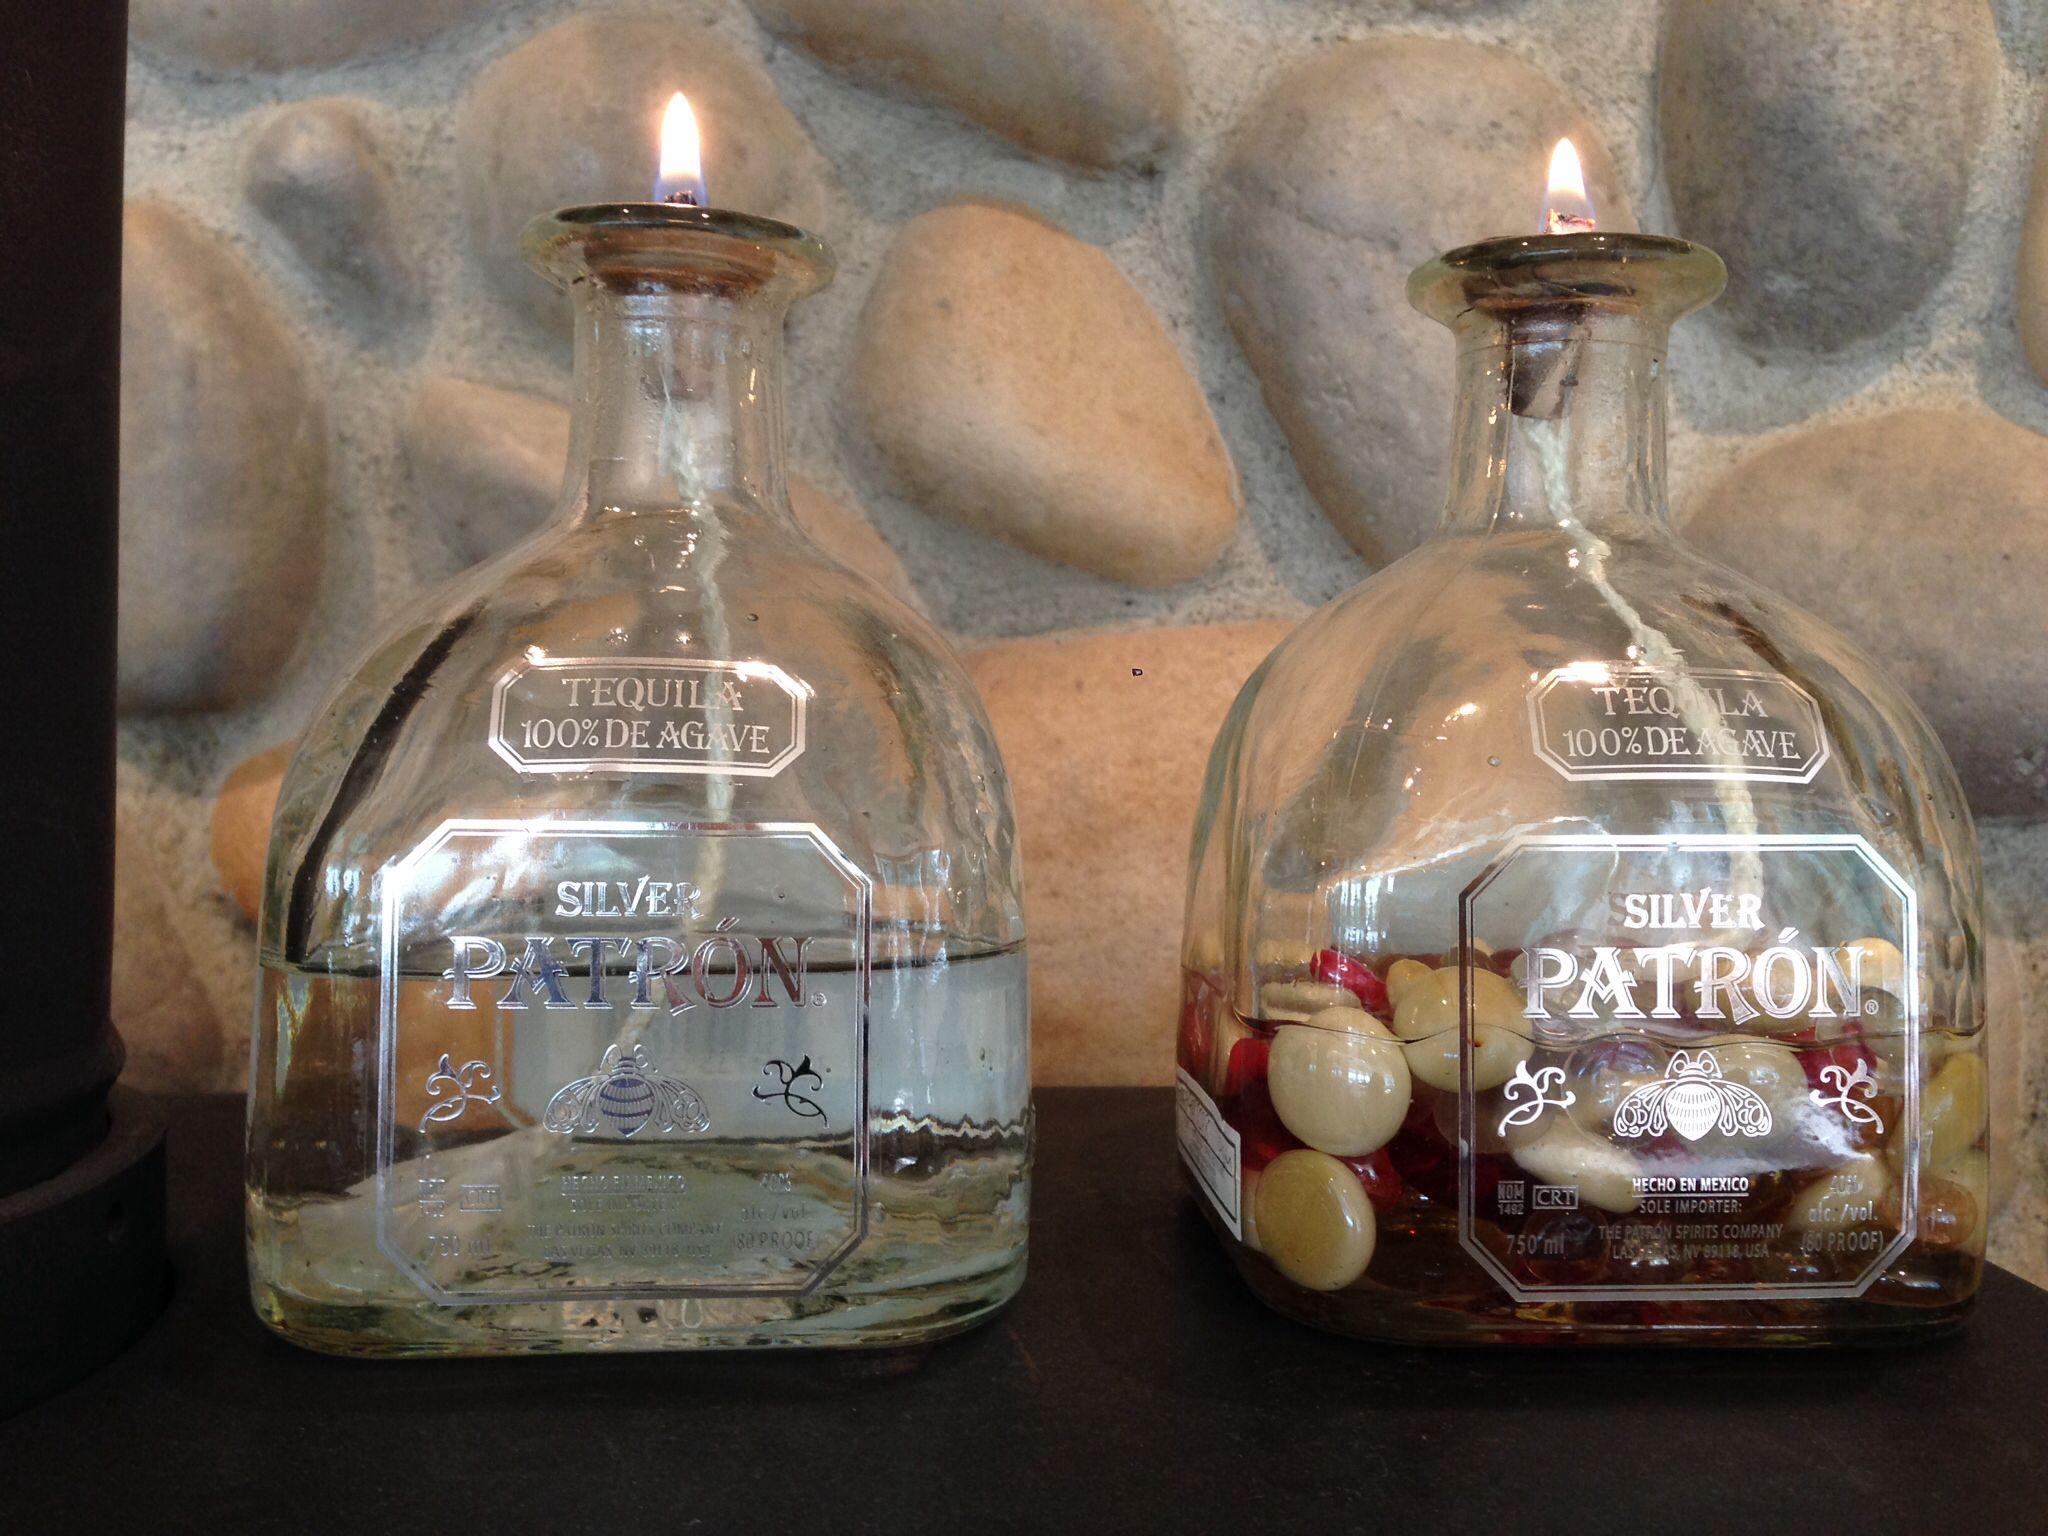 Repurpose Patron bottles into oil lamps Repurpose